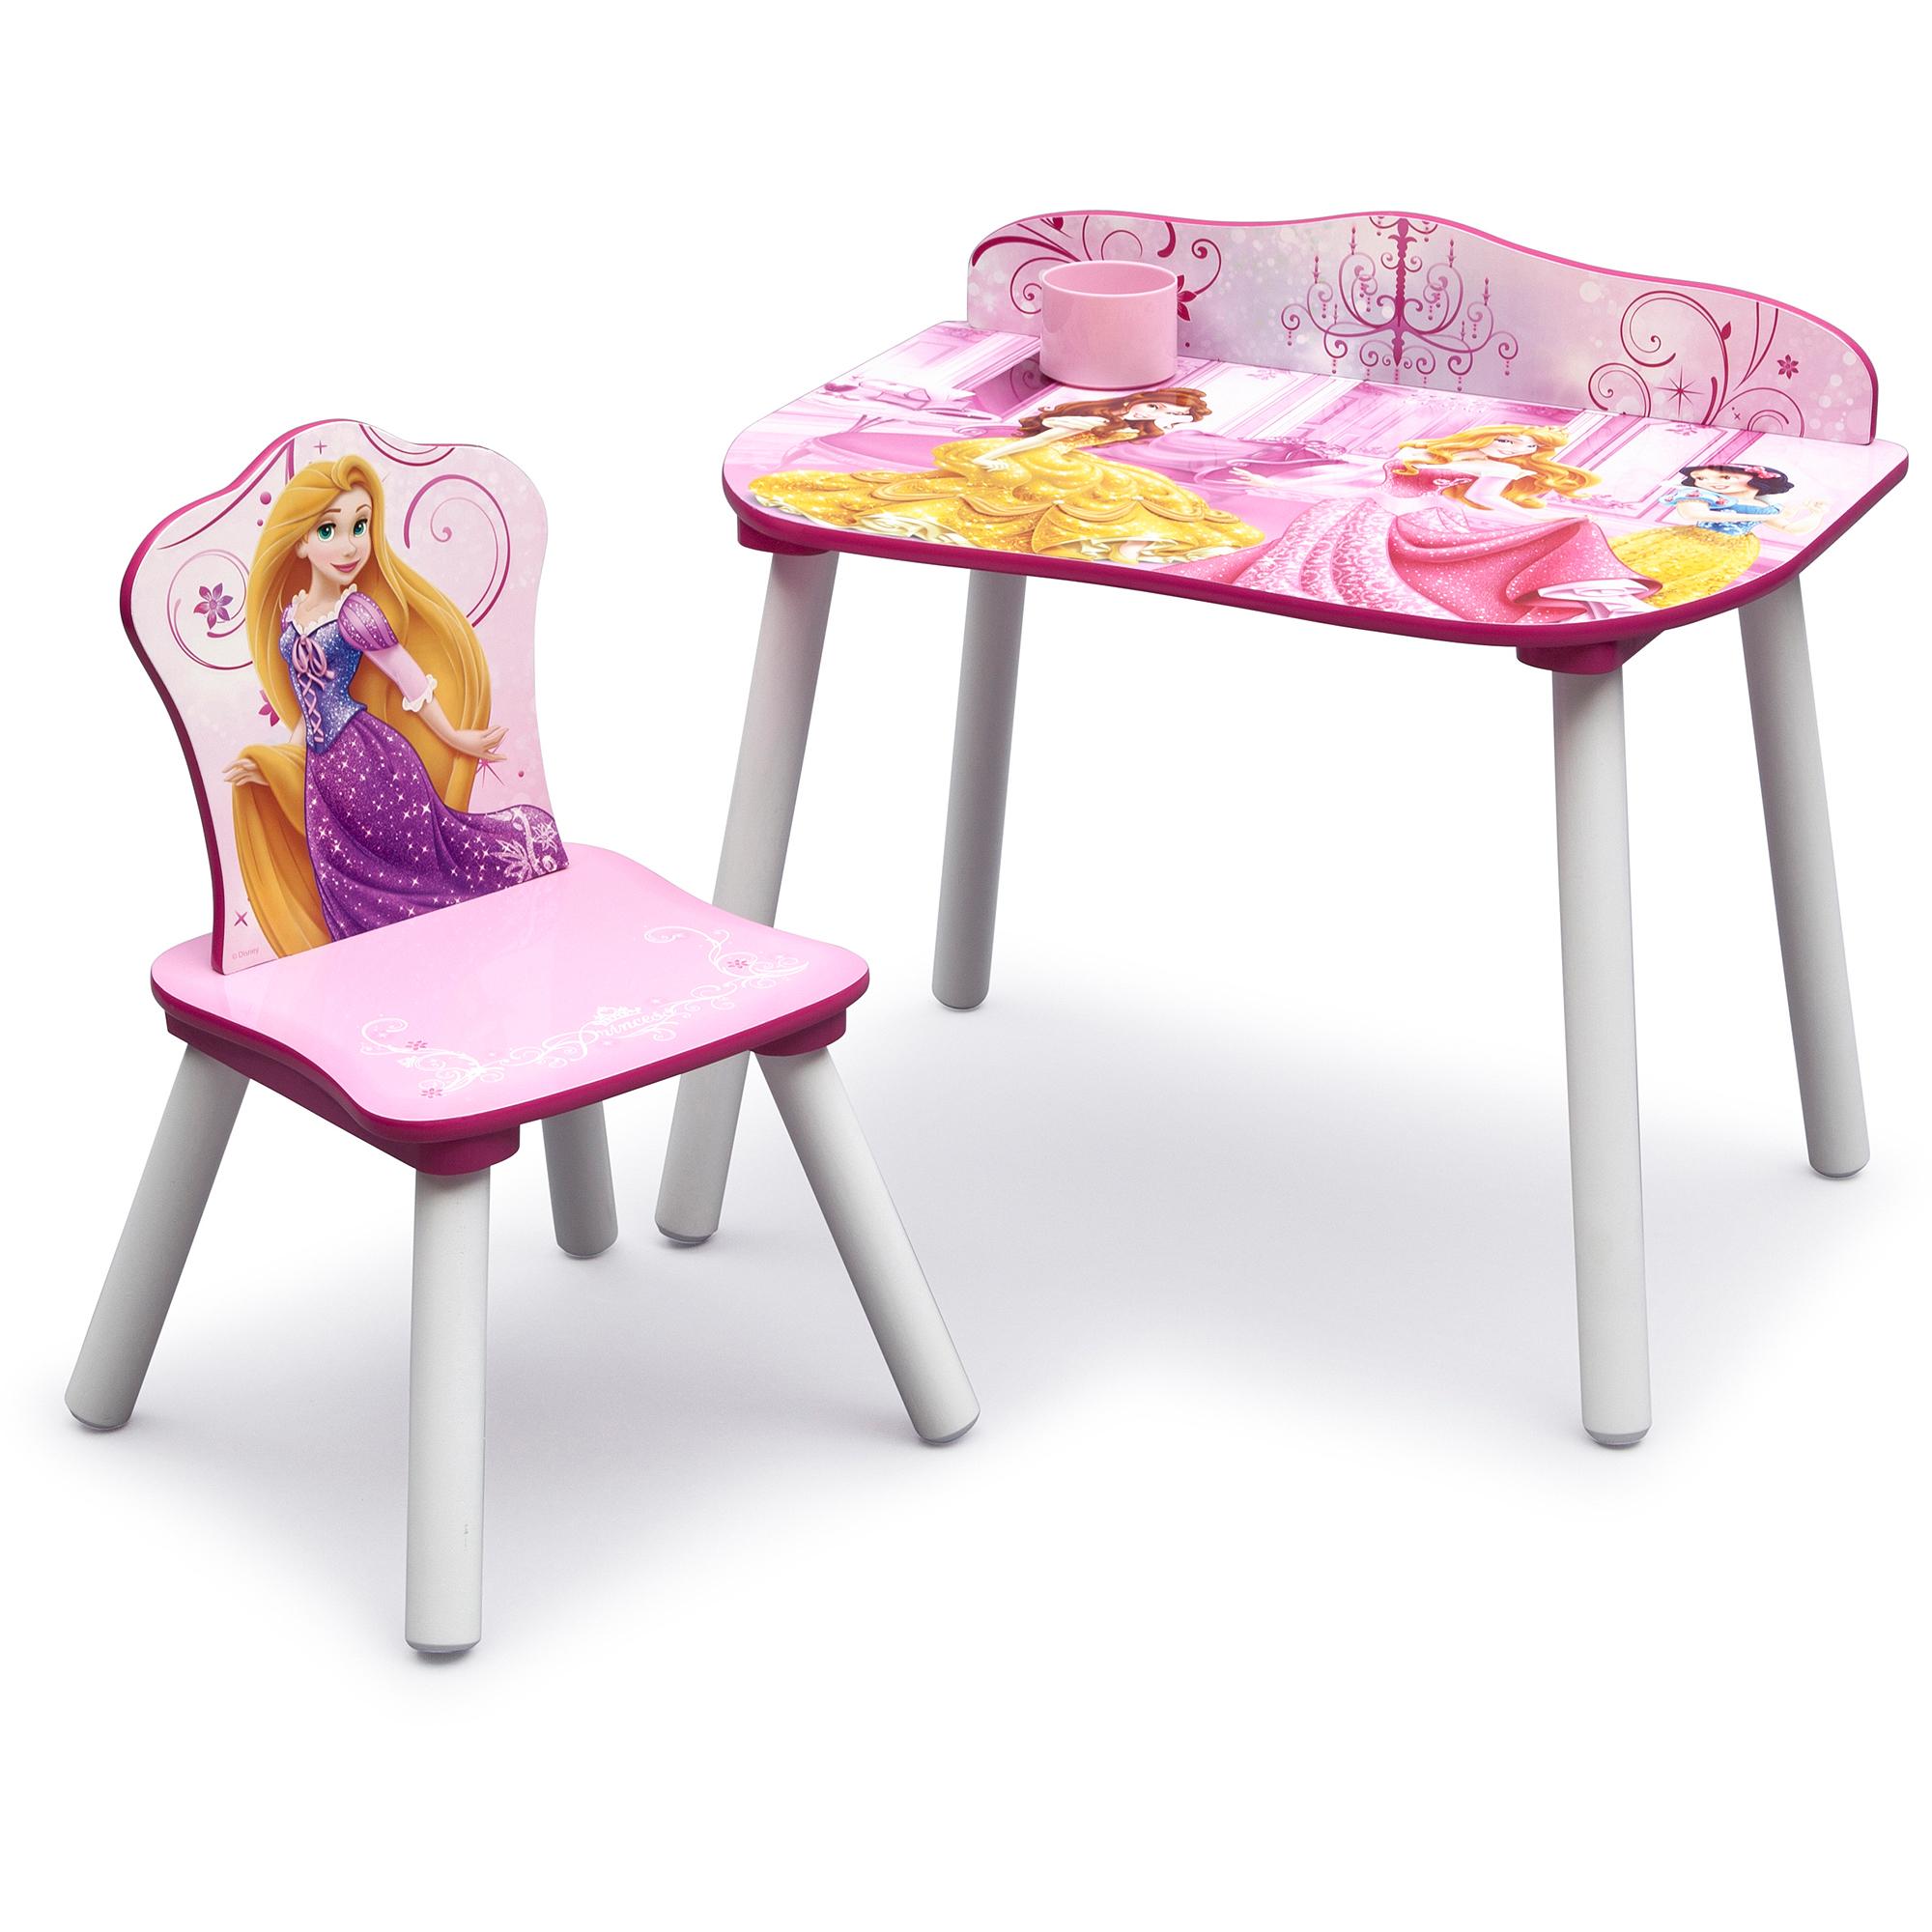 Disney Princess Desk and Chair Set